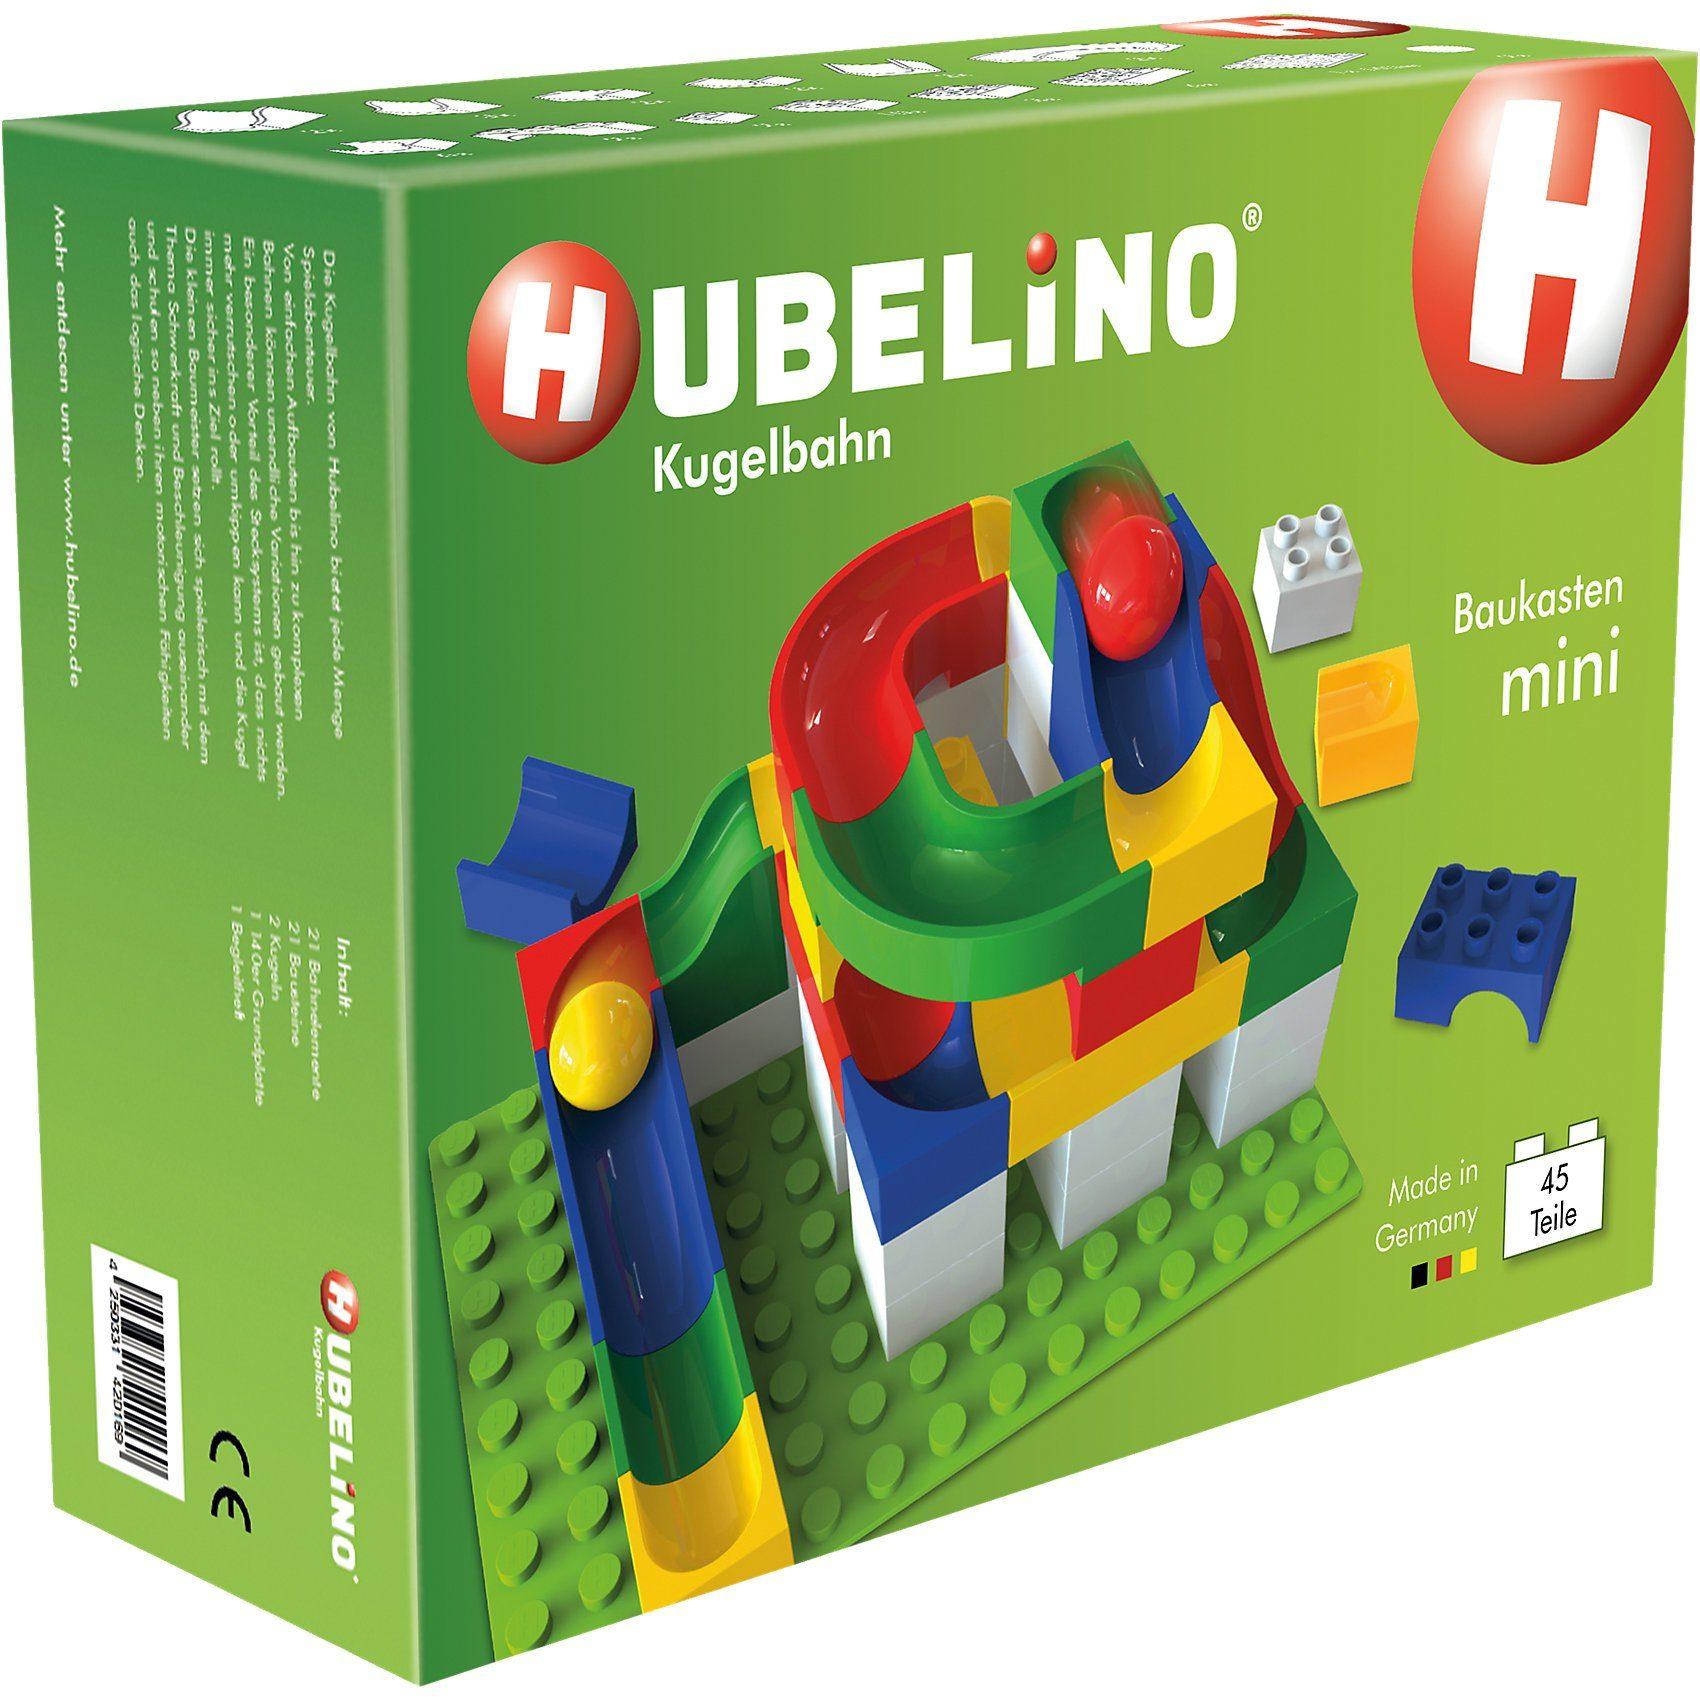 Hubelino - Baukasten mini, 45-tlg.